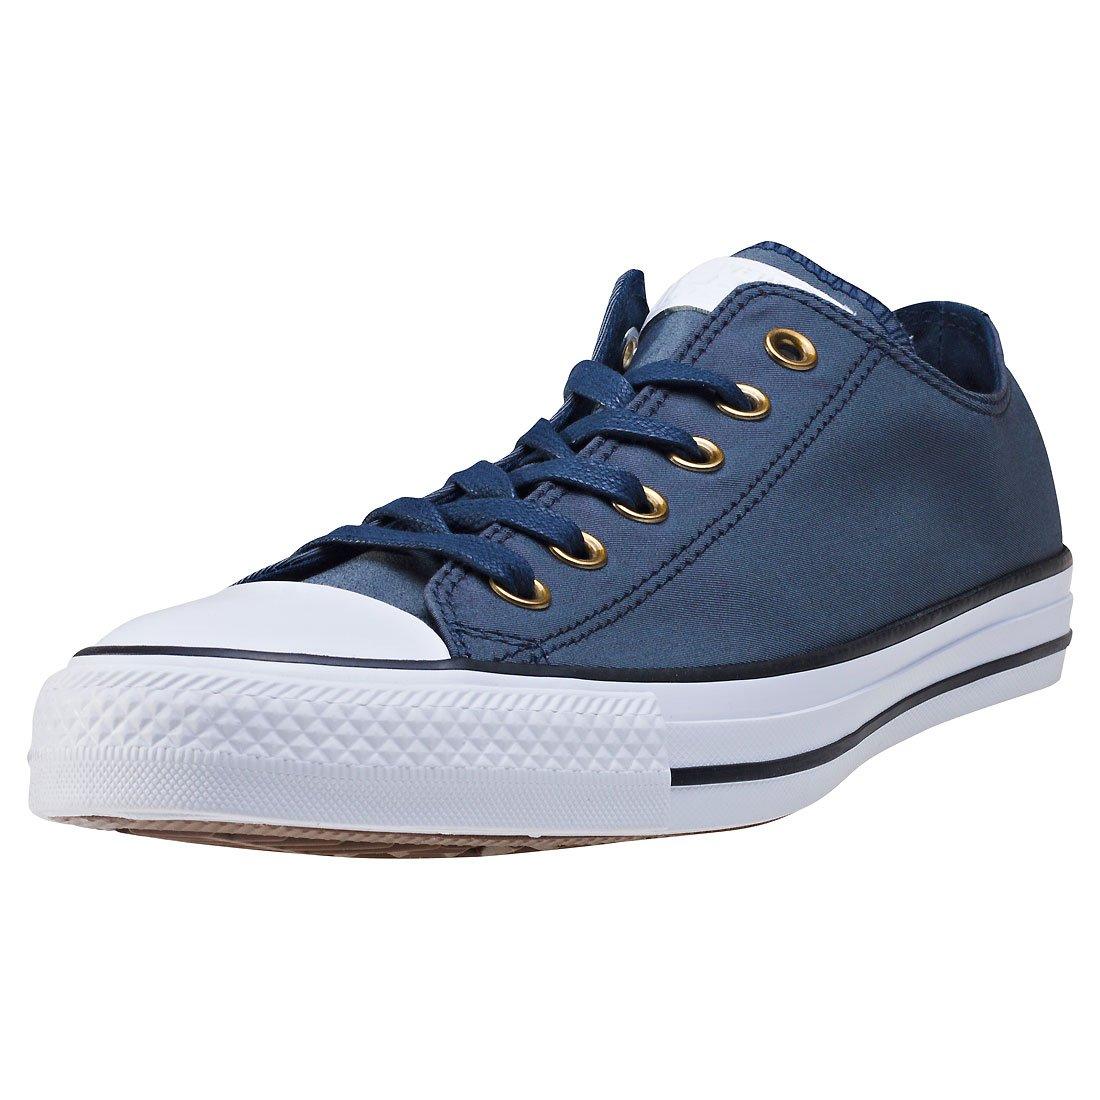 Converse All Star Ox W Calzado 46.5 EU|Blue